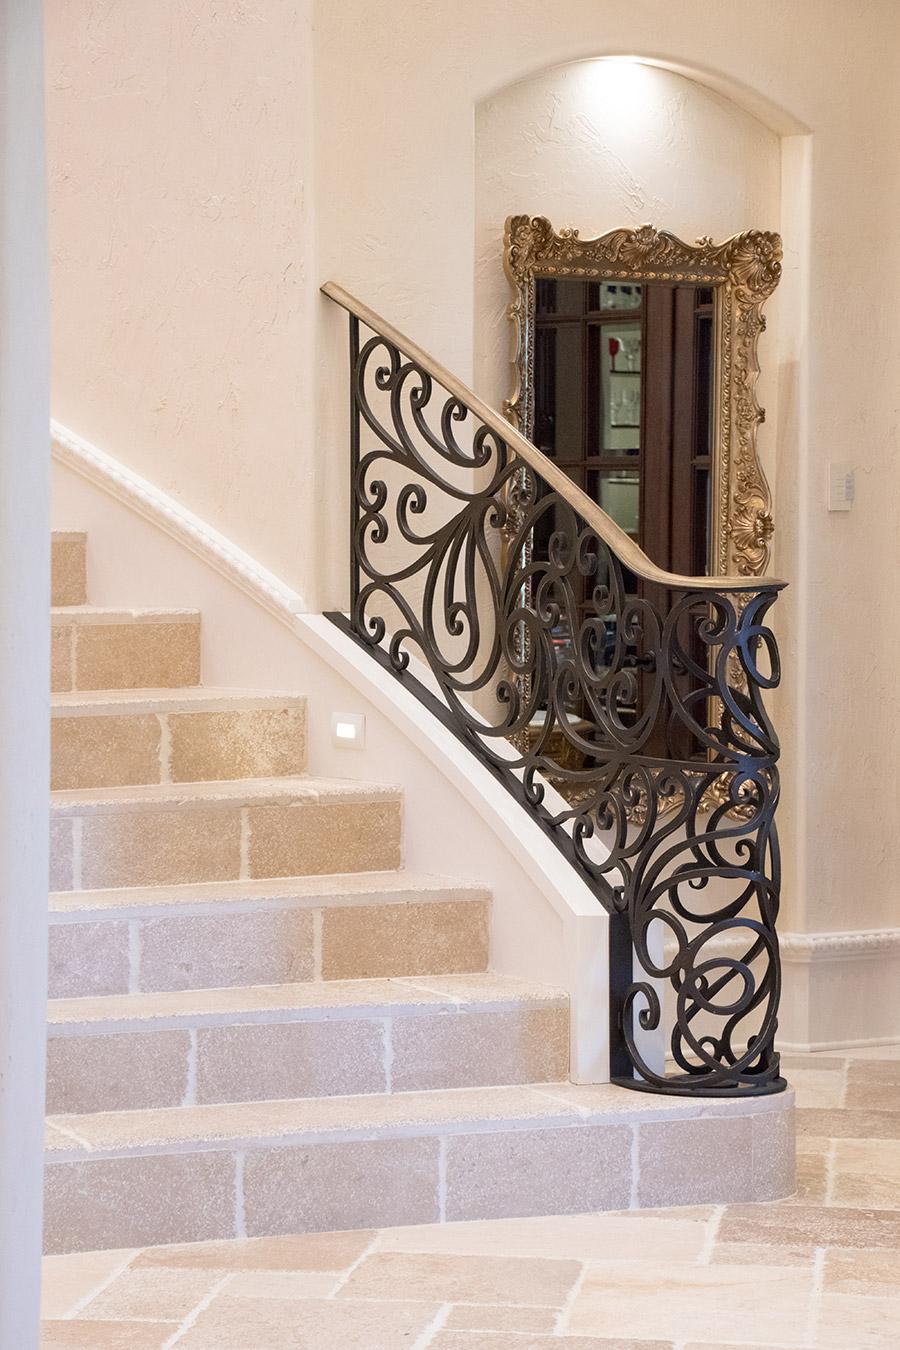 drake-residence-classic-steel-custom-outdoor-lifghting-architectural-doors-railings-winecellar-(143)